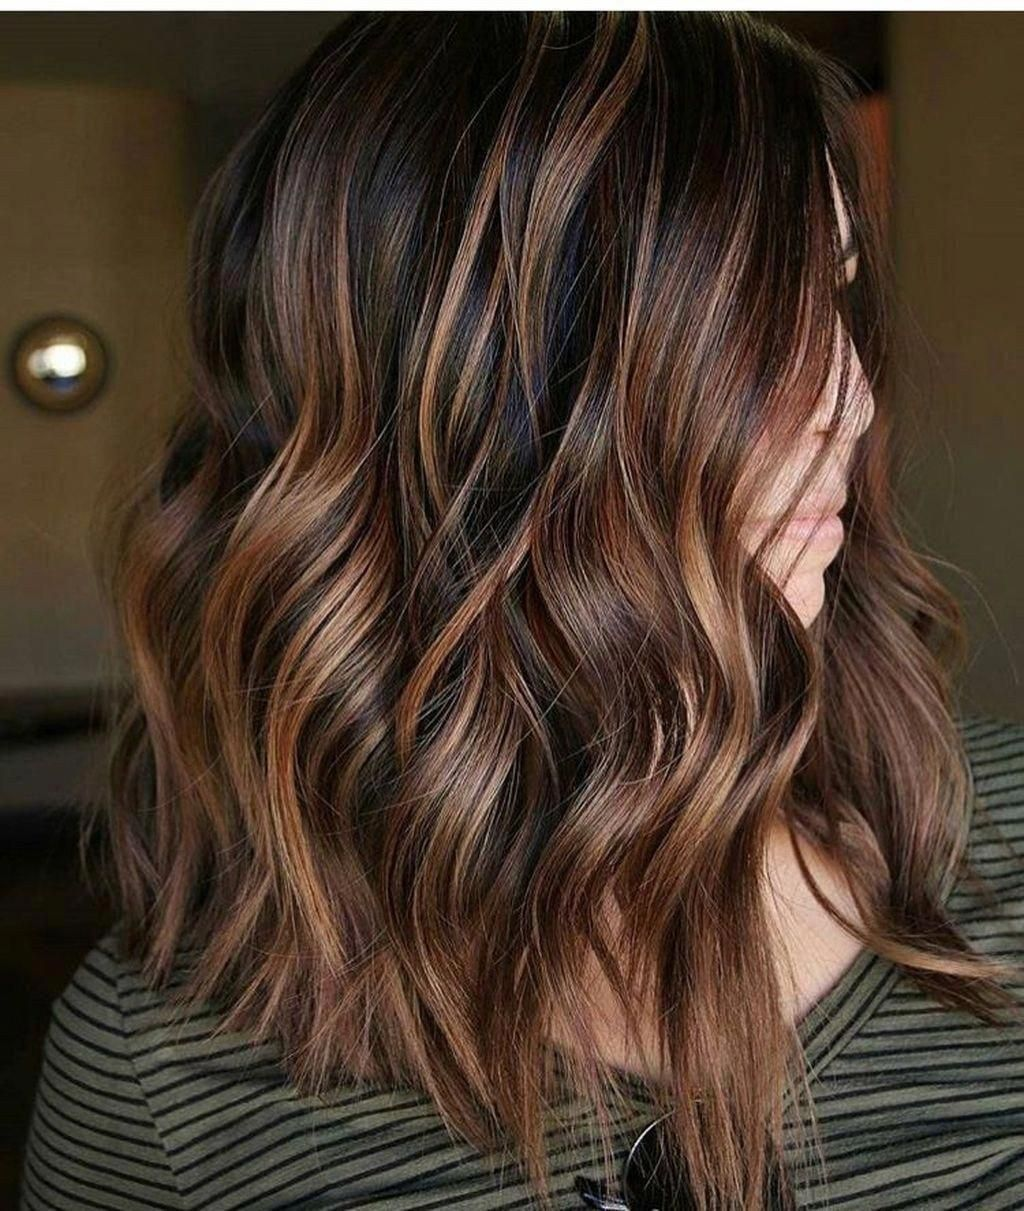 48 Stunning Fall Hair Color Ideas 2018 Trends Addicfashion Haircolorideasforbrunettes Brownha In 2020 Caramel Brown Hair Brown Hair Balayage Brown Hair Color Chart